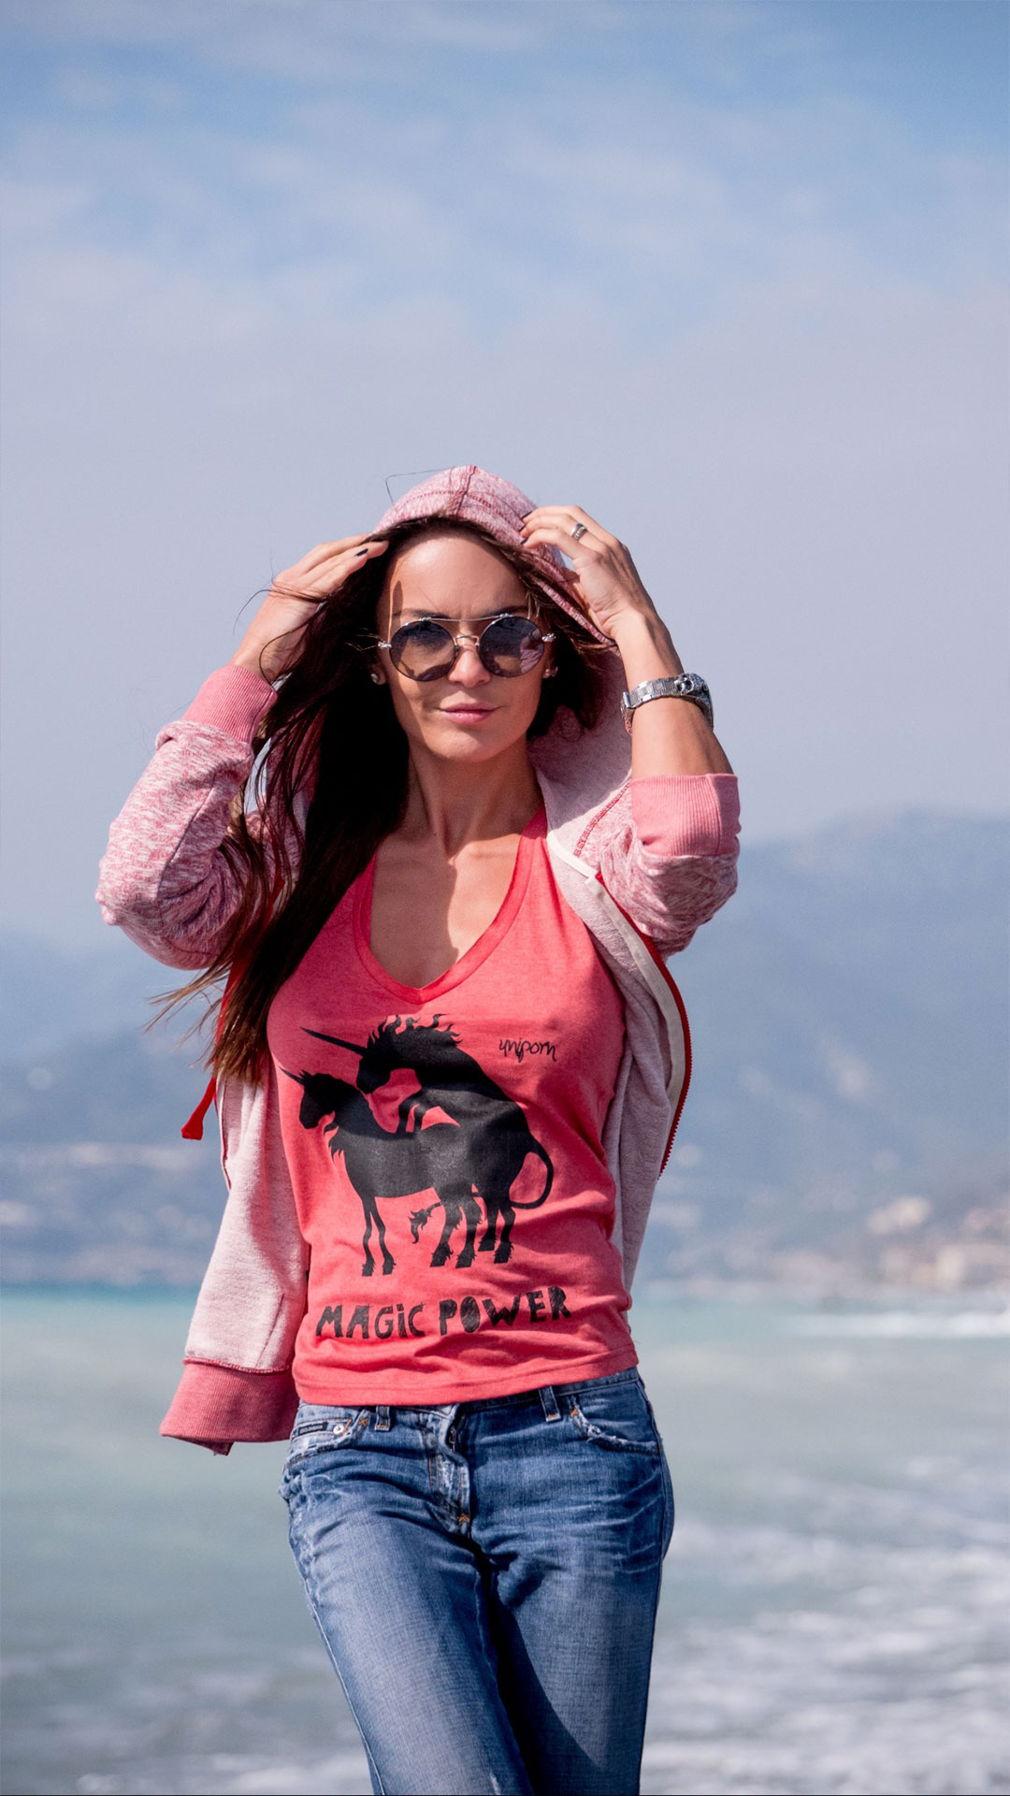 Розовая футболка Magic Power